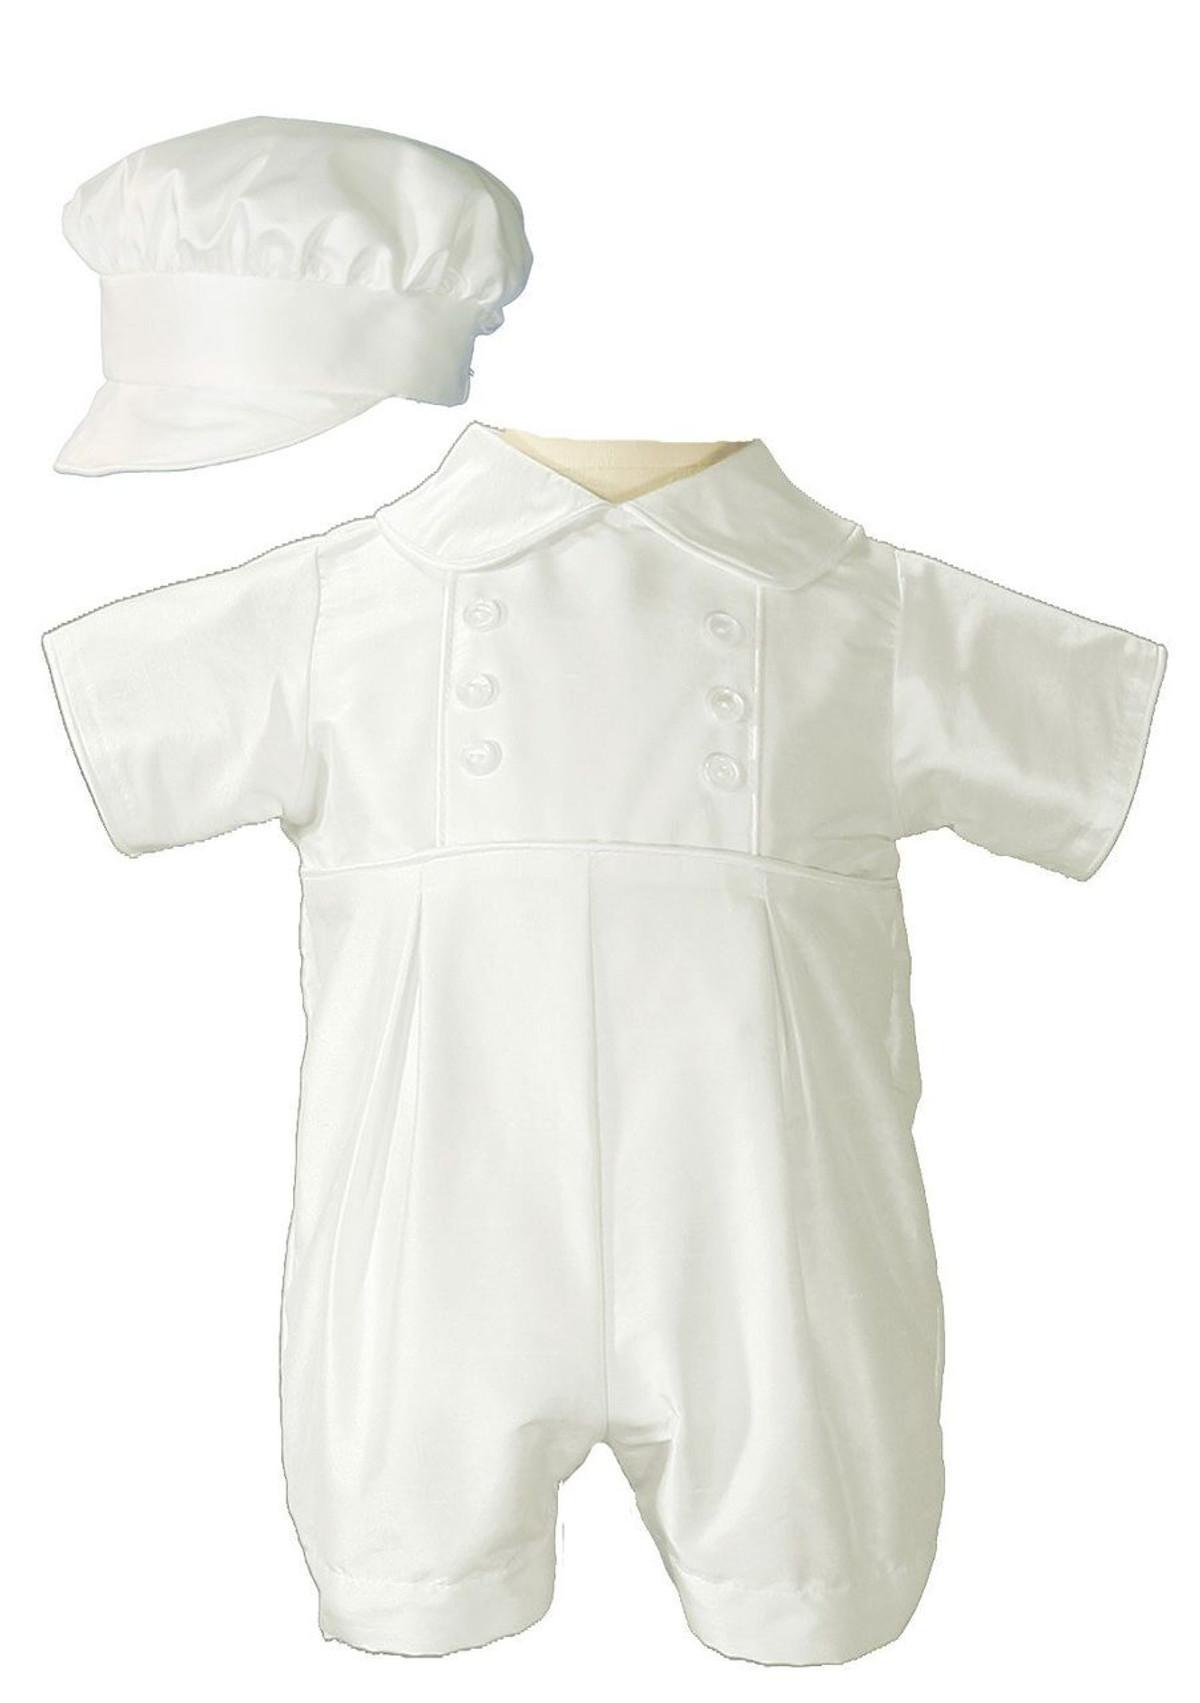 44e3c98749166 Boys Silk Dupioni Christening Outfit Baptism Romper with Bonnet Hat